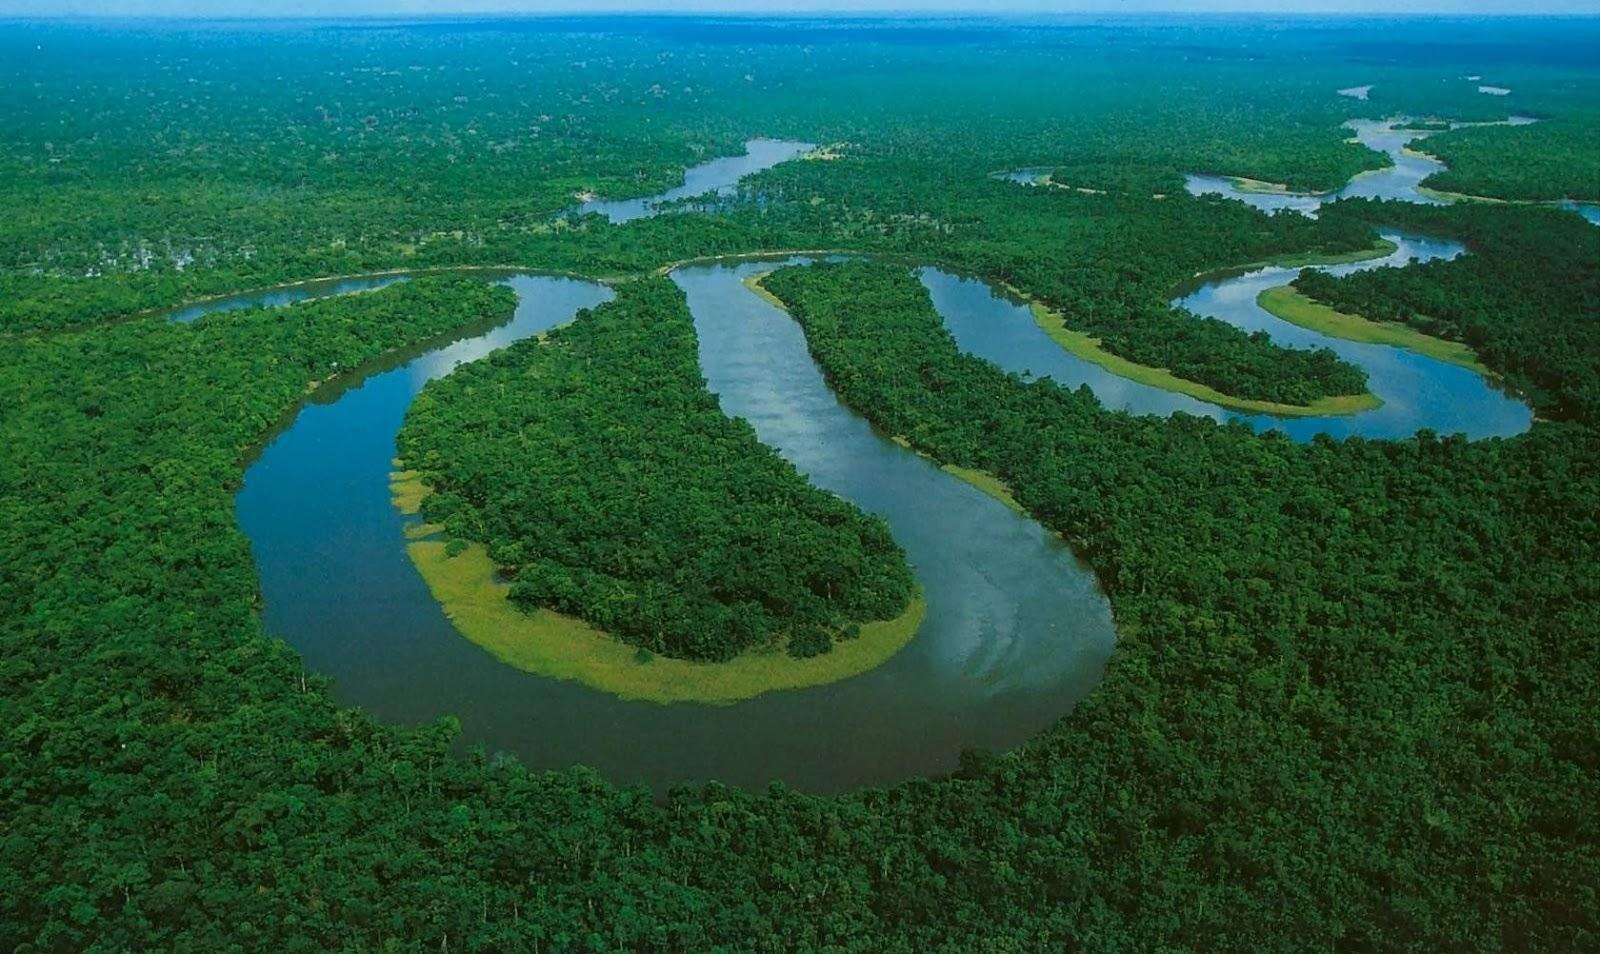 Rio Juruá, Afluente do Rio Amazonas